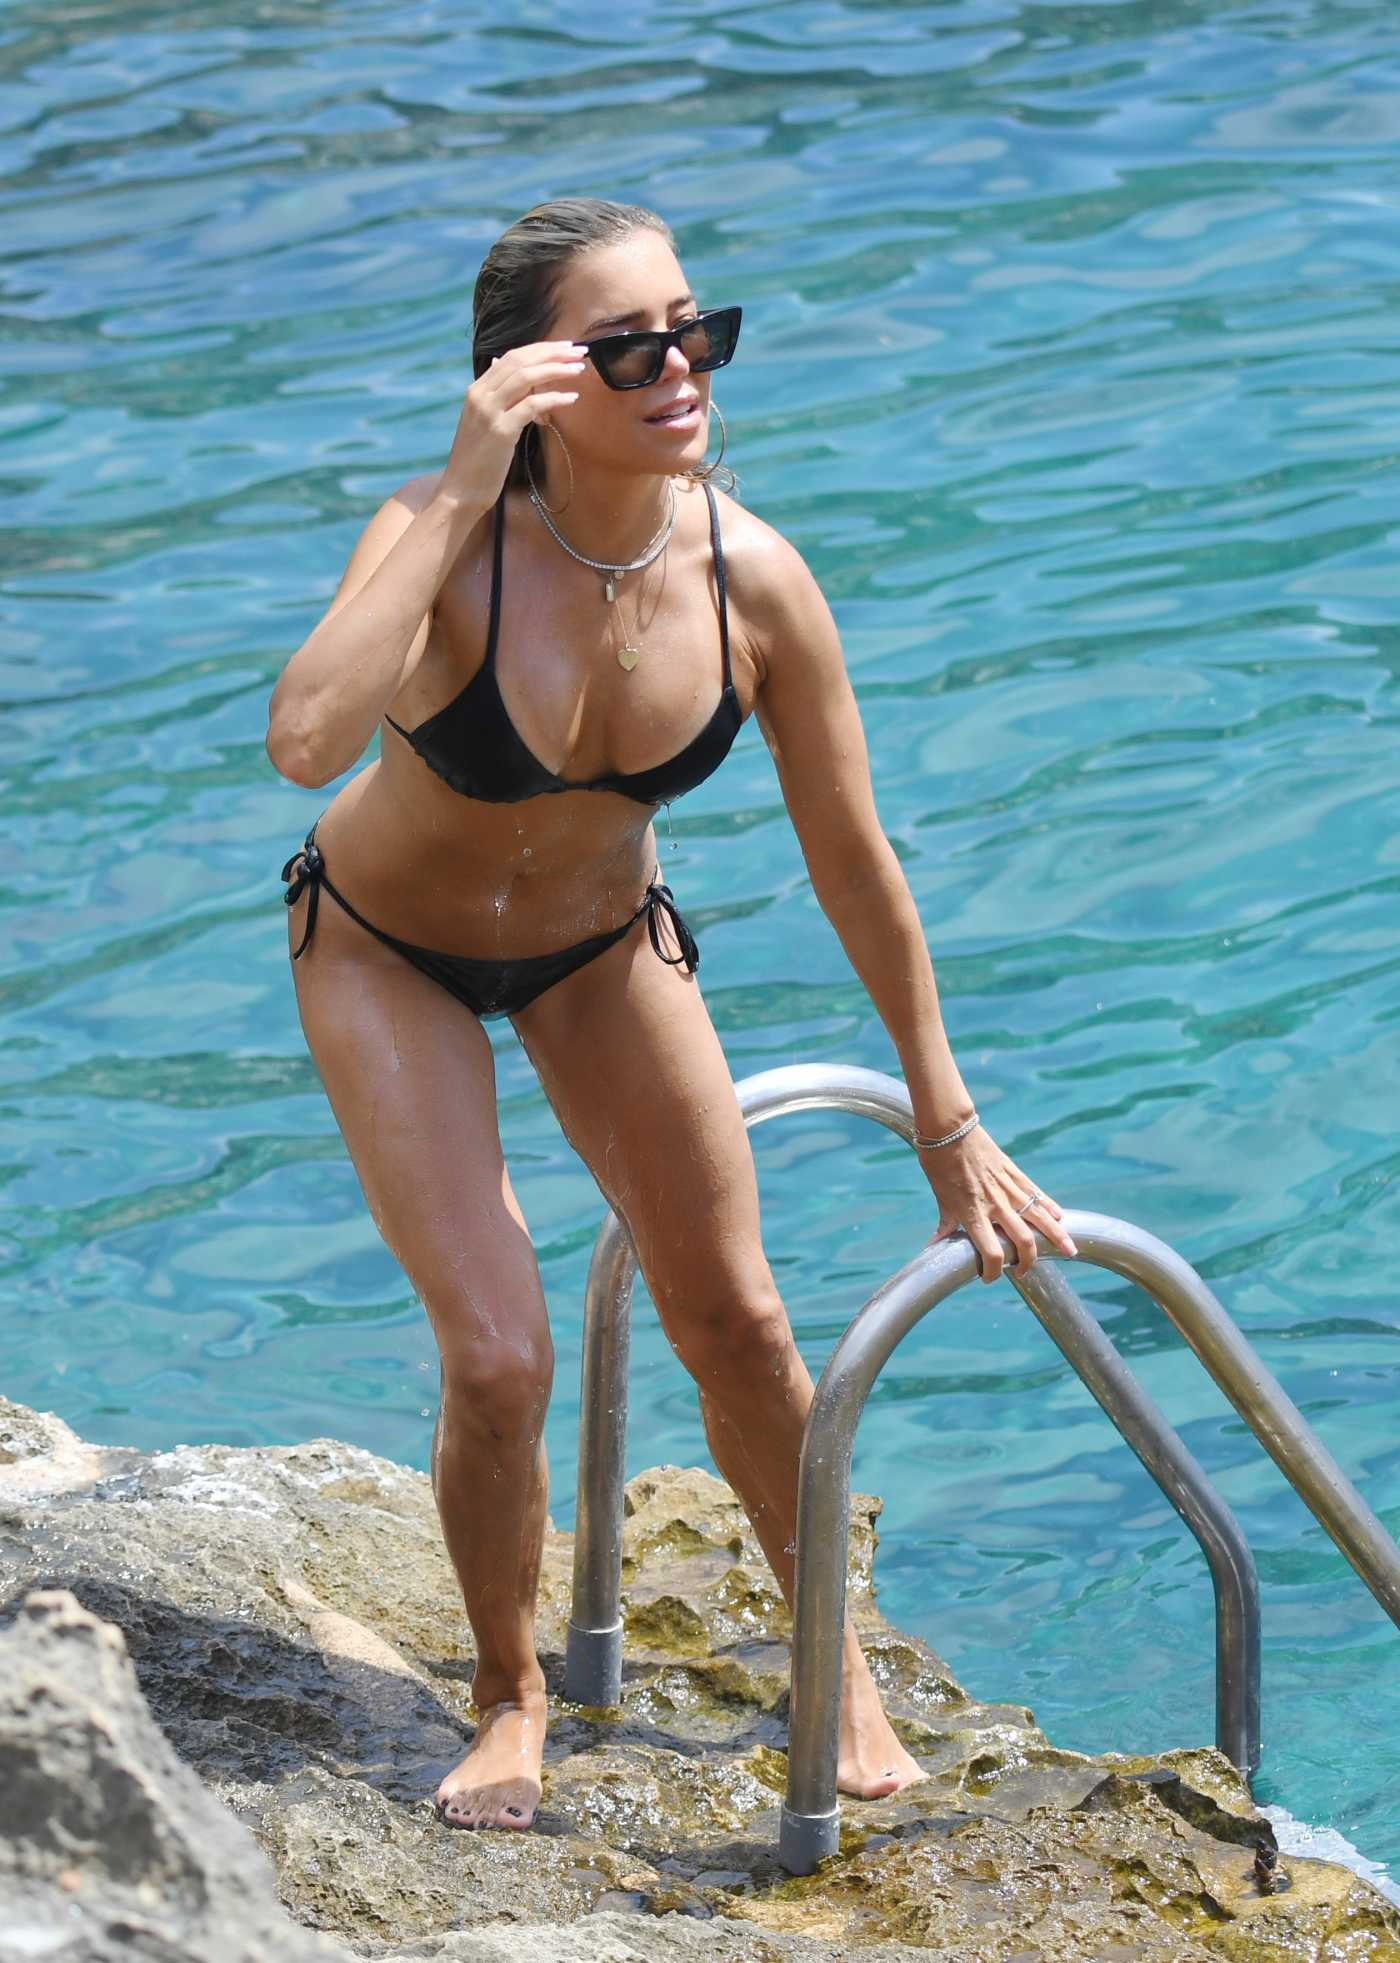 Sylvie Meis in a Black Bikini on the Beach in Mallorca, Spain 07/22/2020